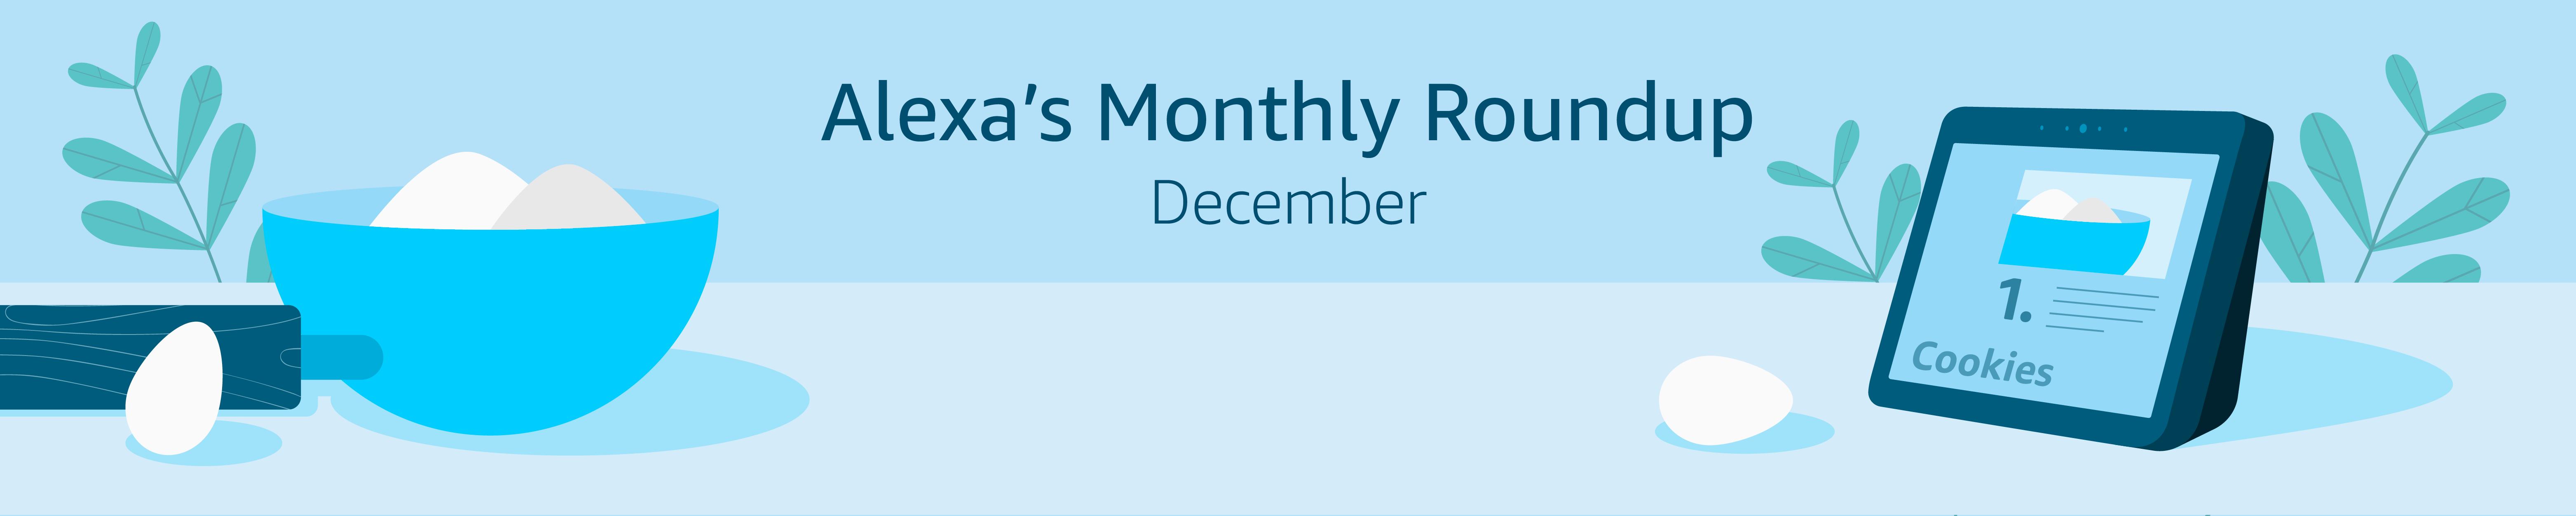 Alexa's Monthly Roundup: December